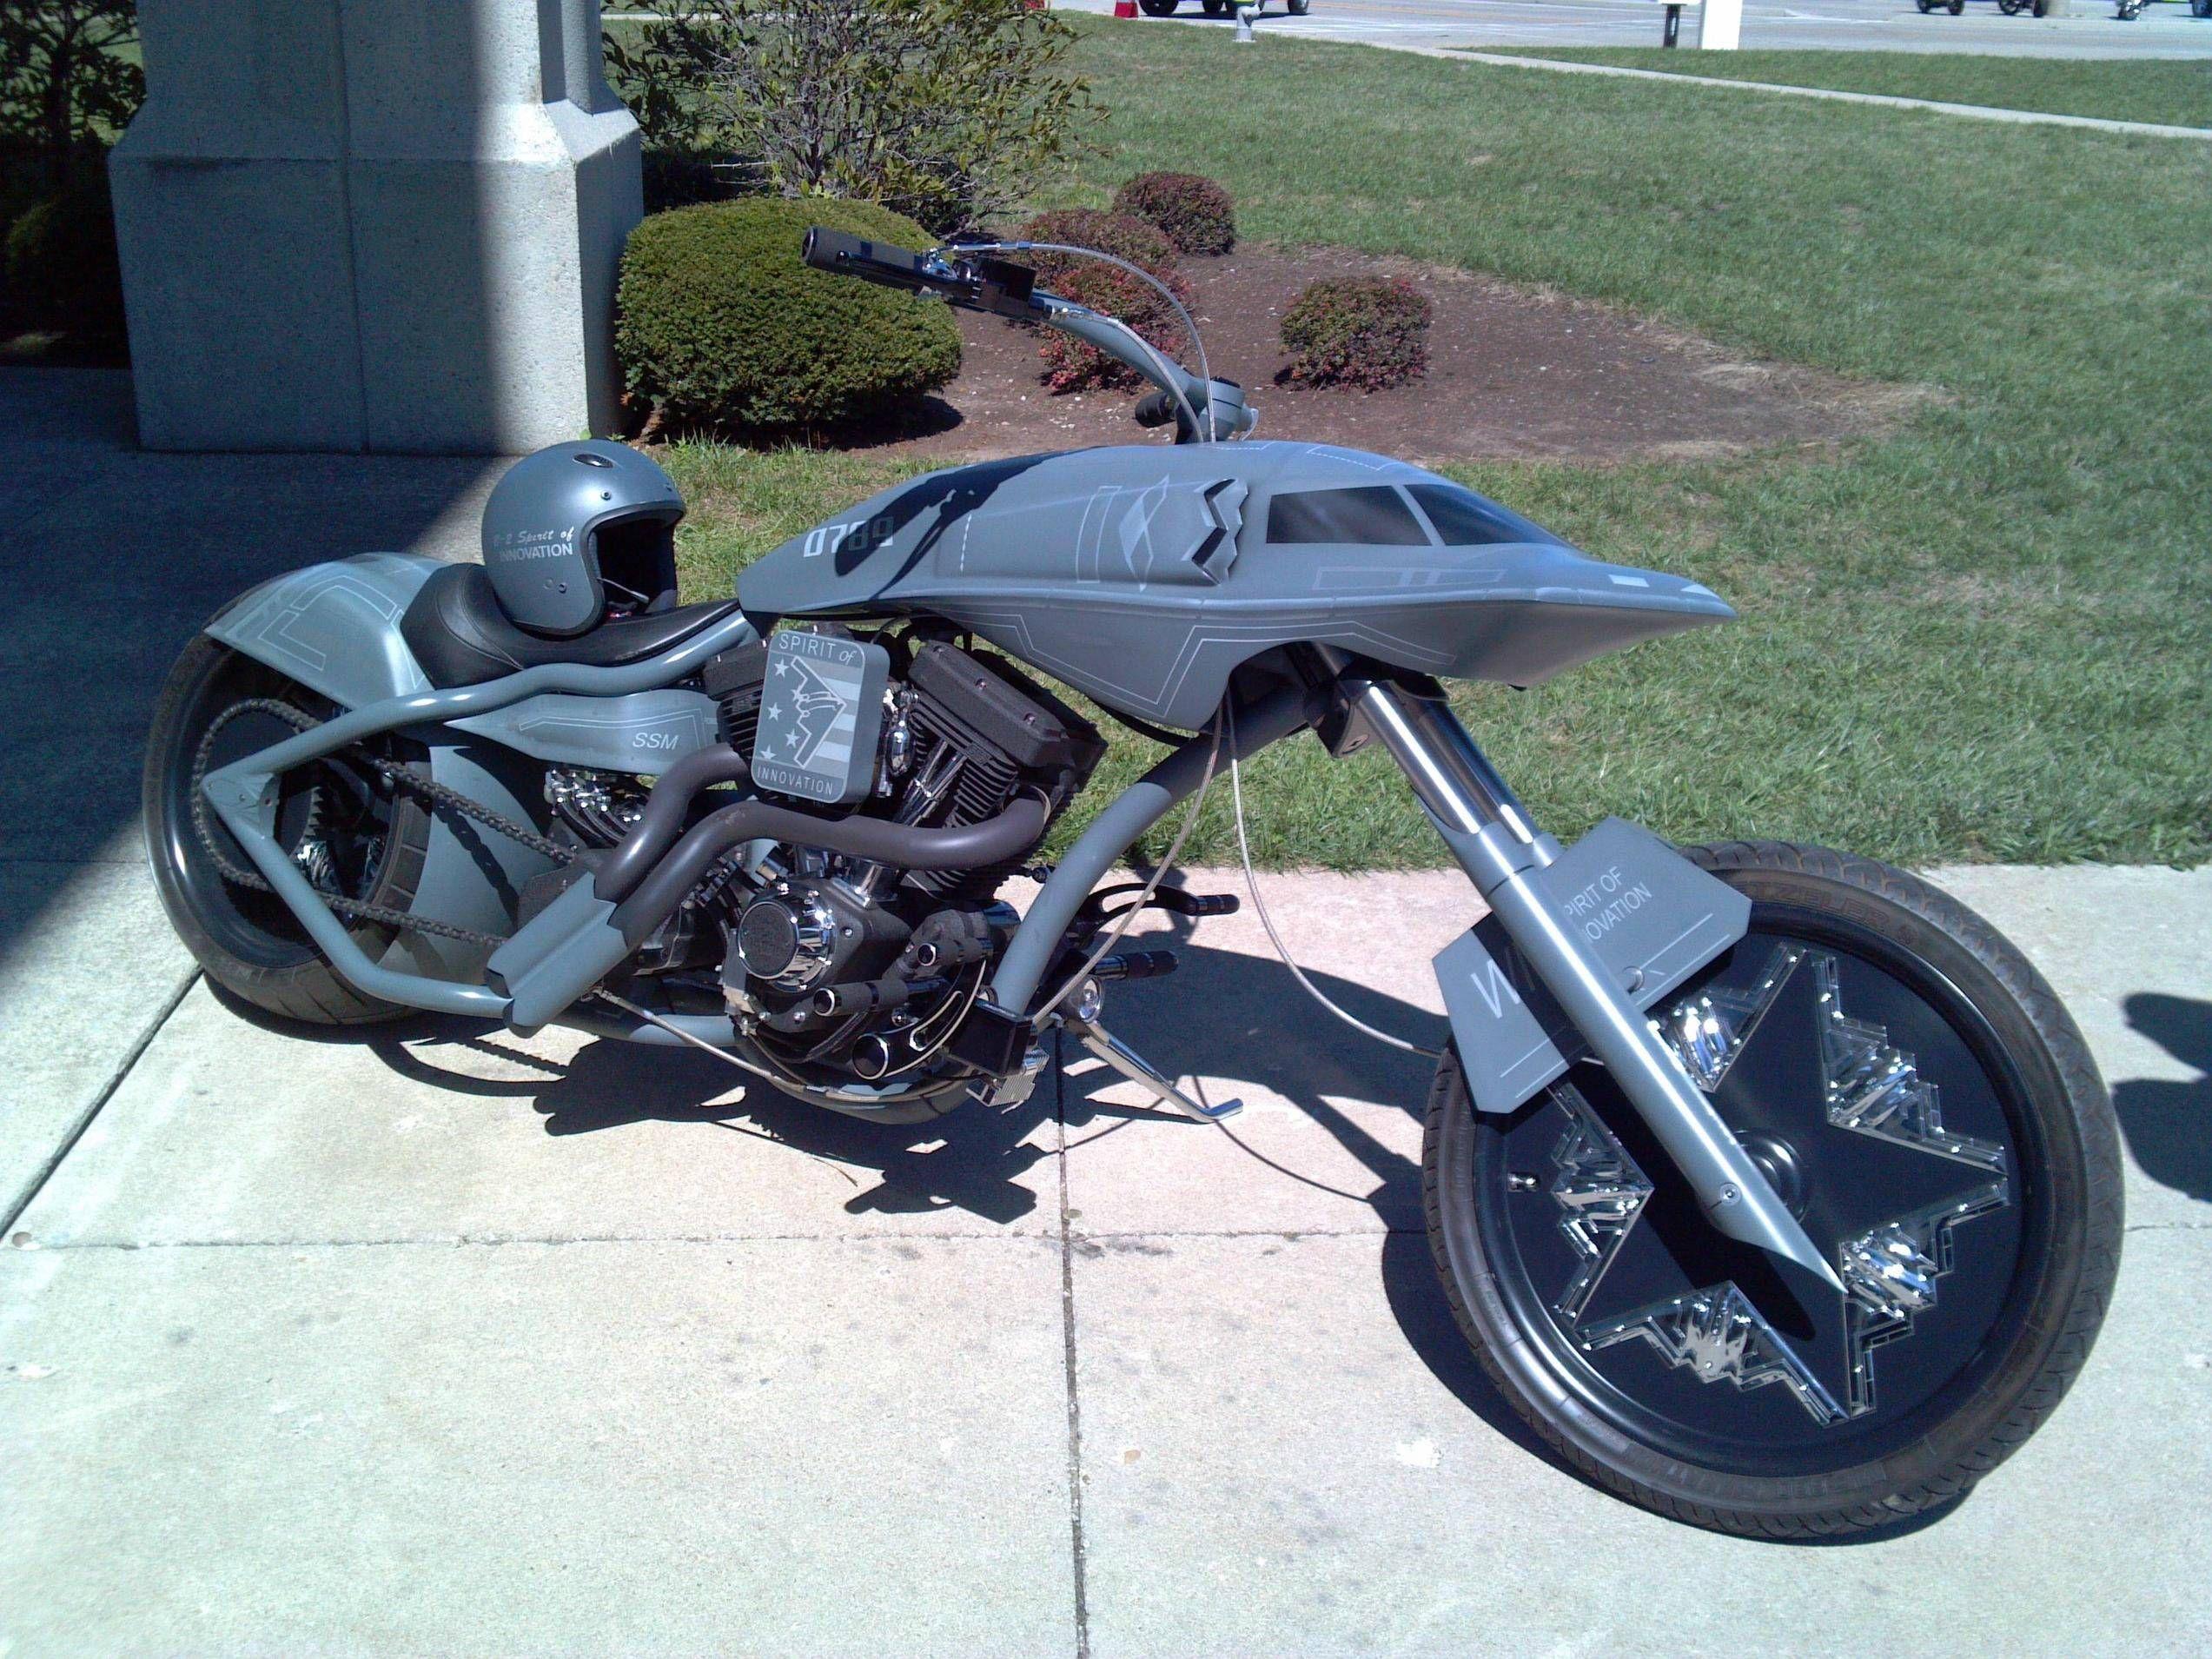 Картинки мотоциклов с приколами